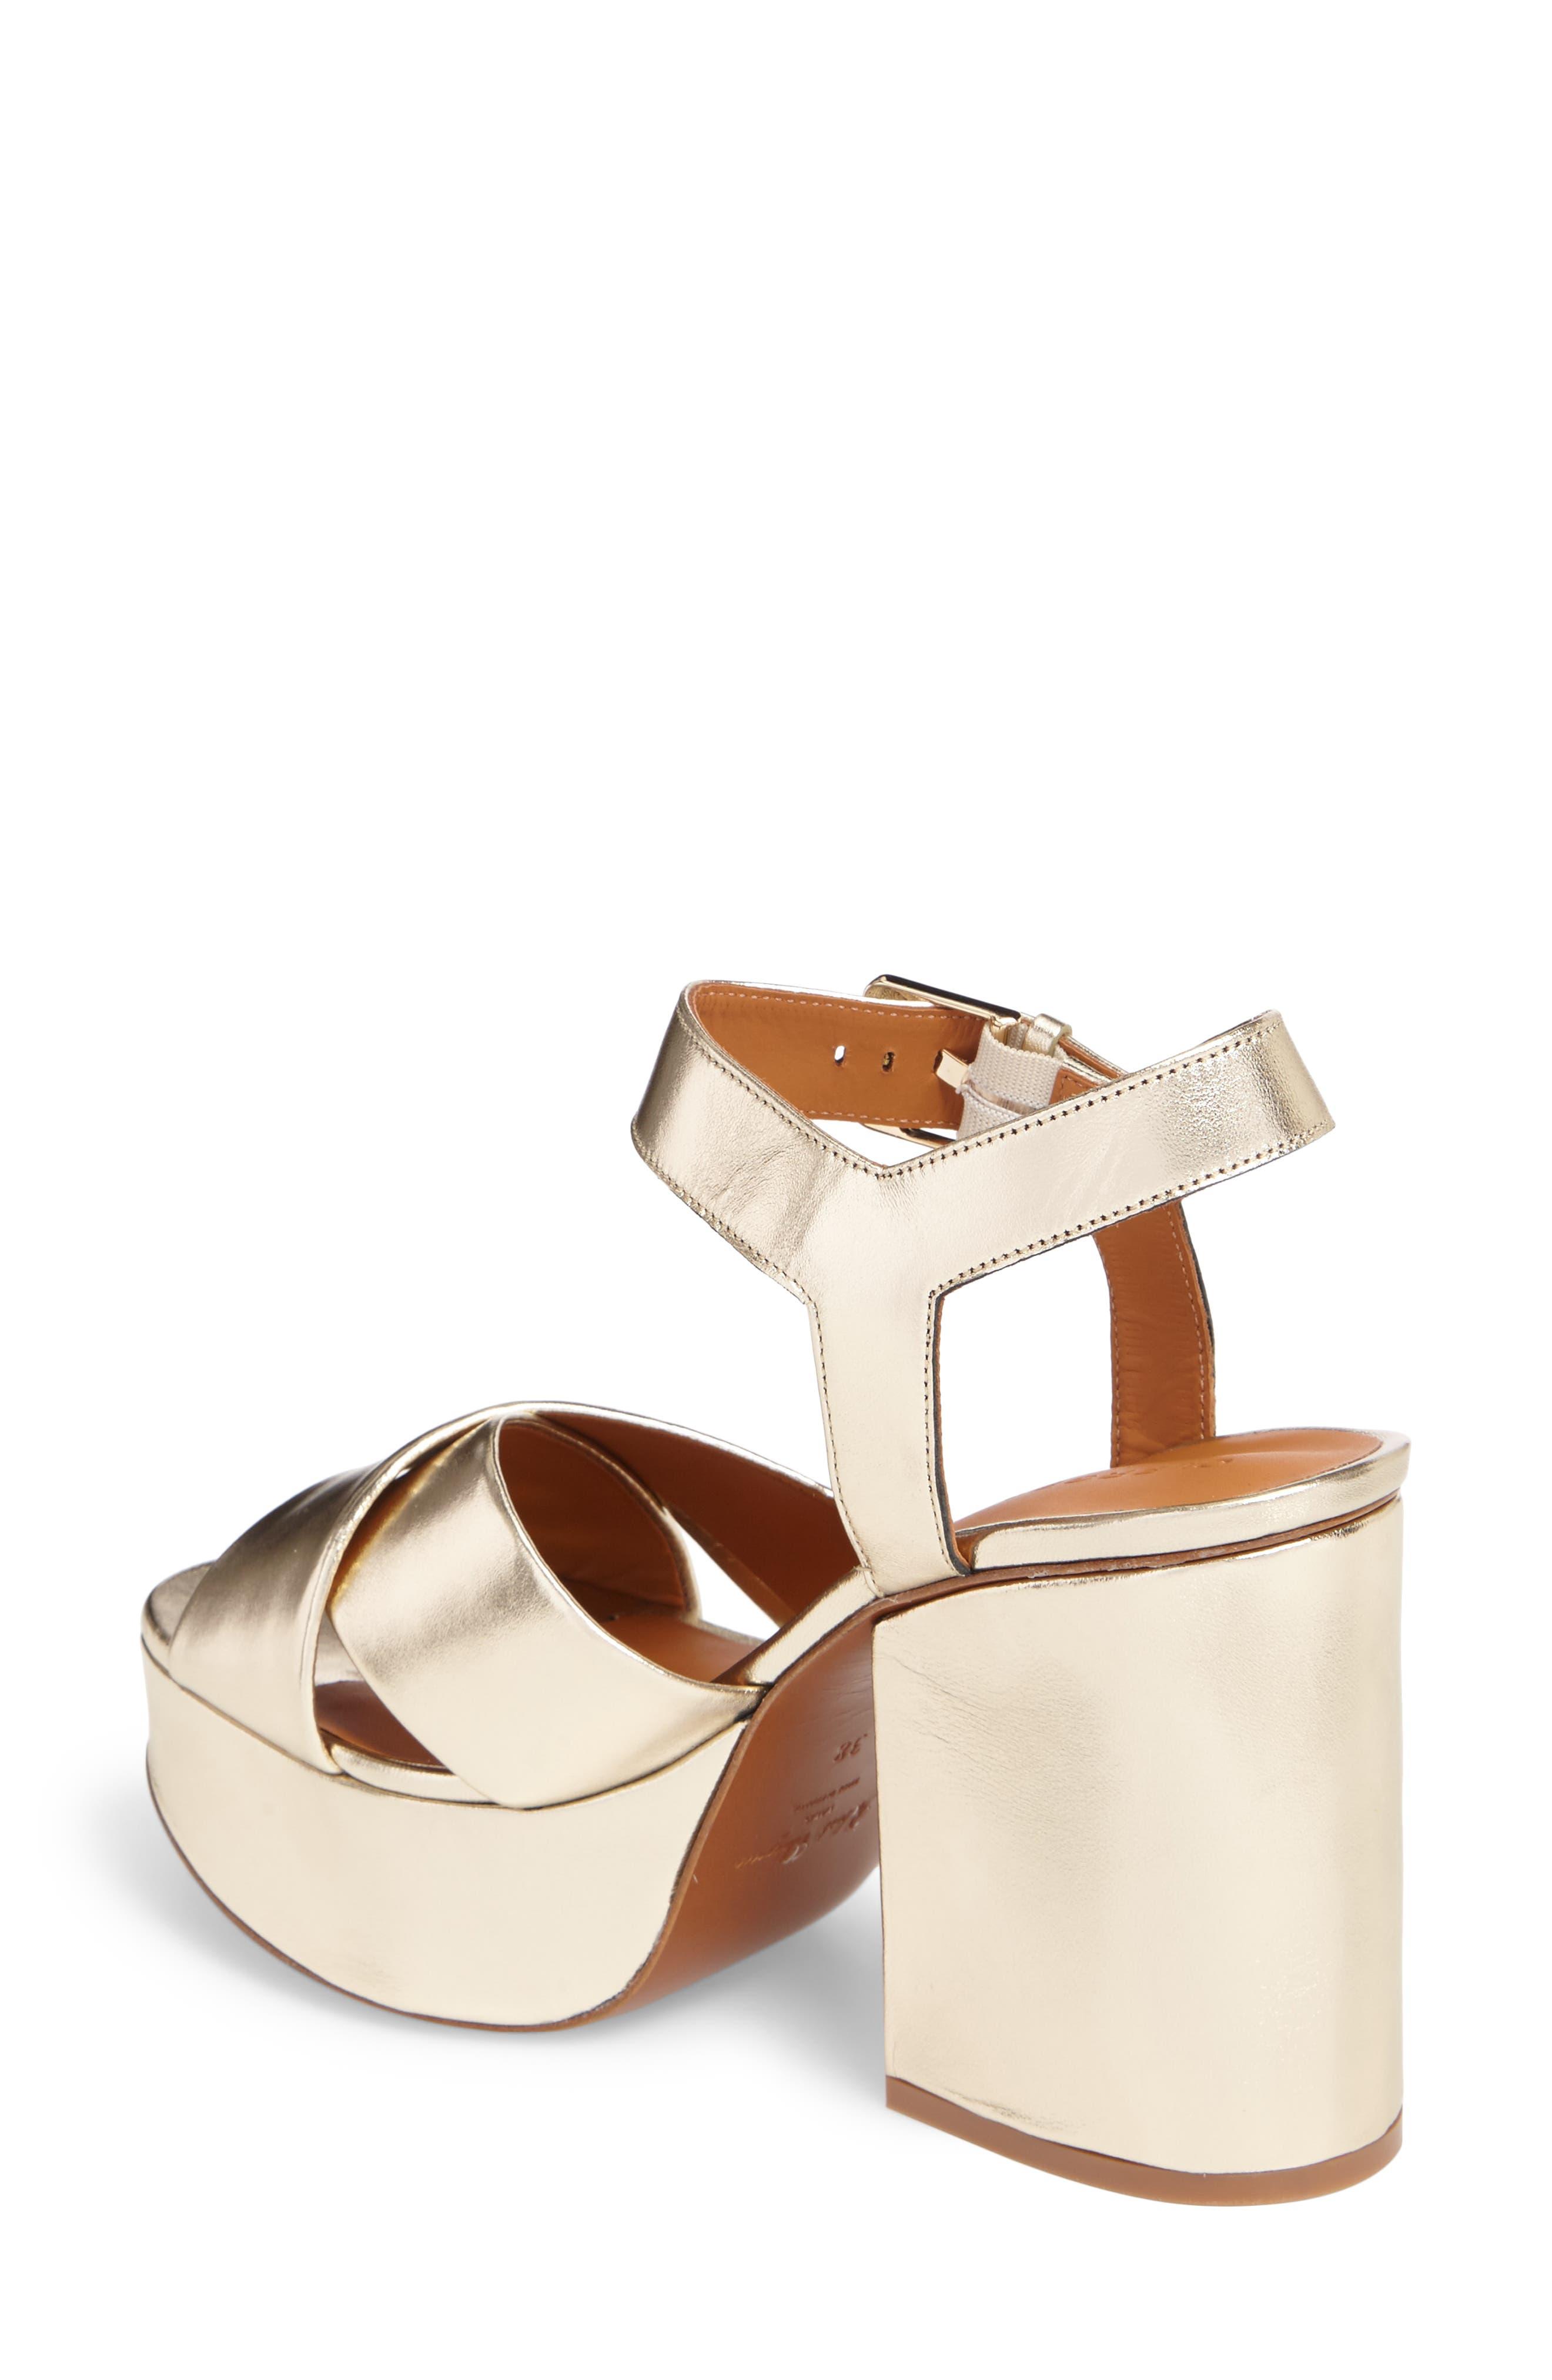 Vianne Ankle Strap Platform Sandal,                             Alternate thumbnail 2, color,                             Metallic Gold